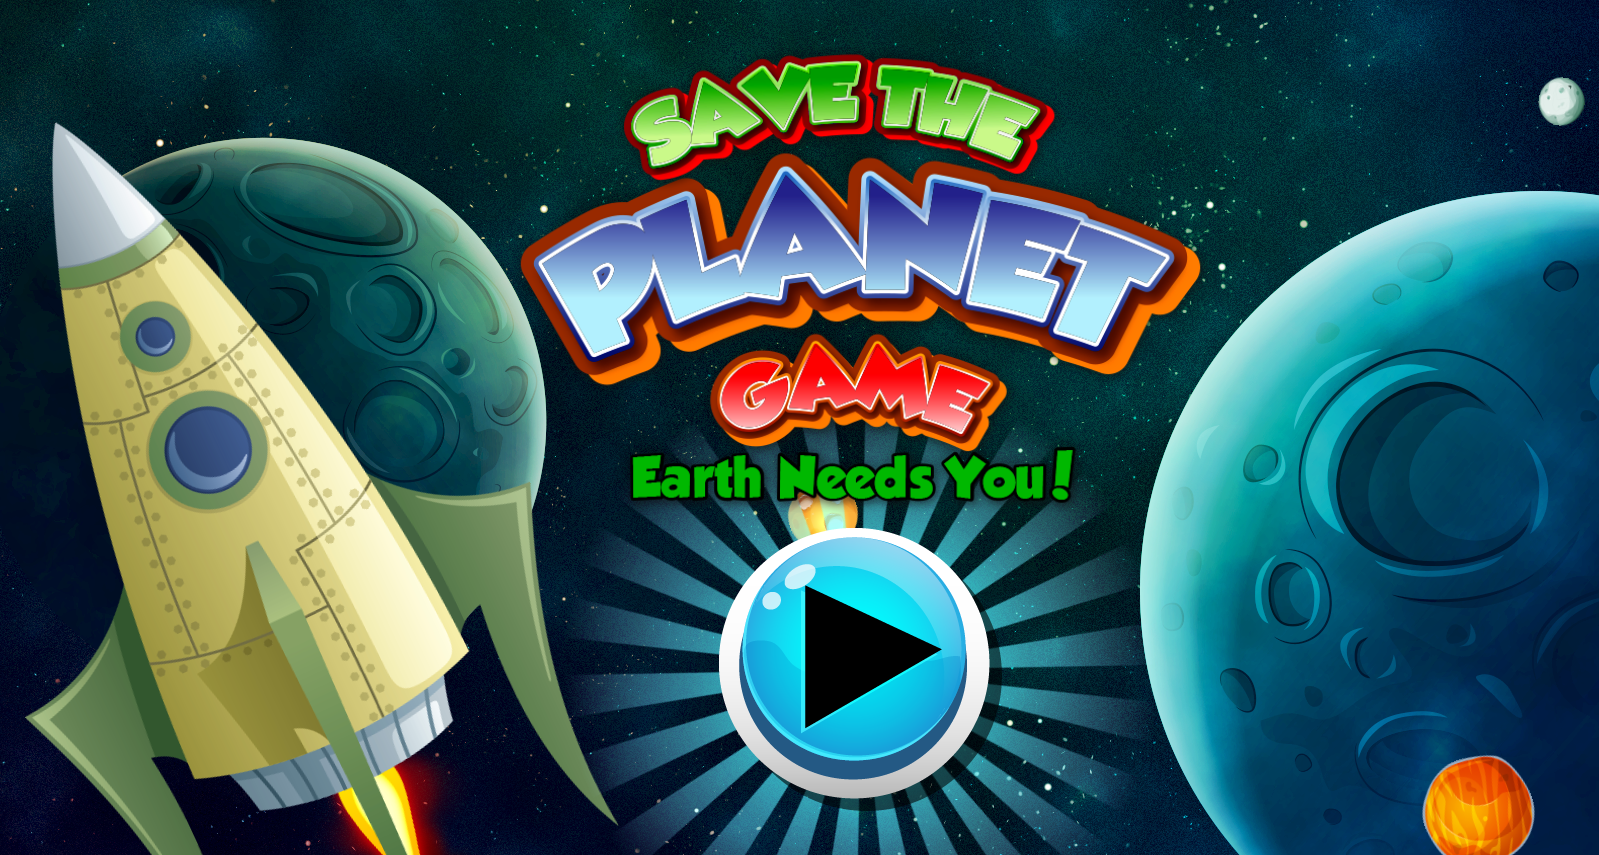 Save The Planet Game Prongo Com